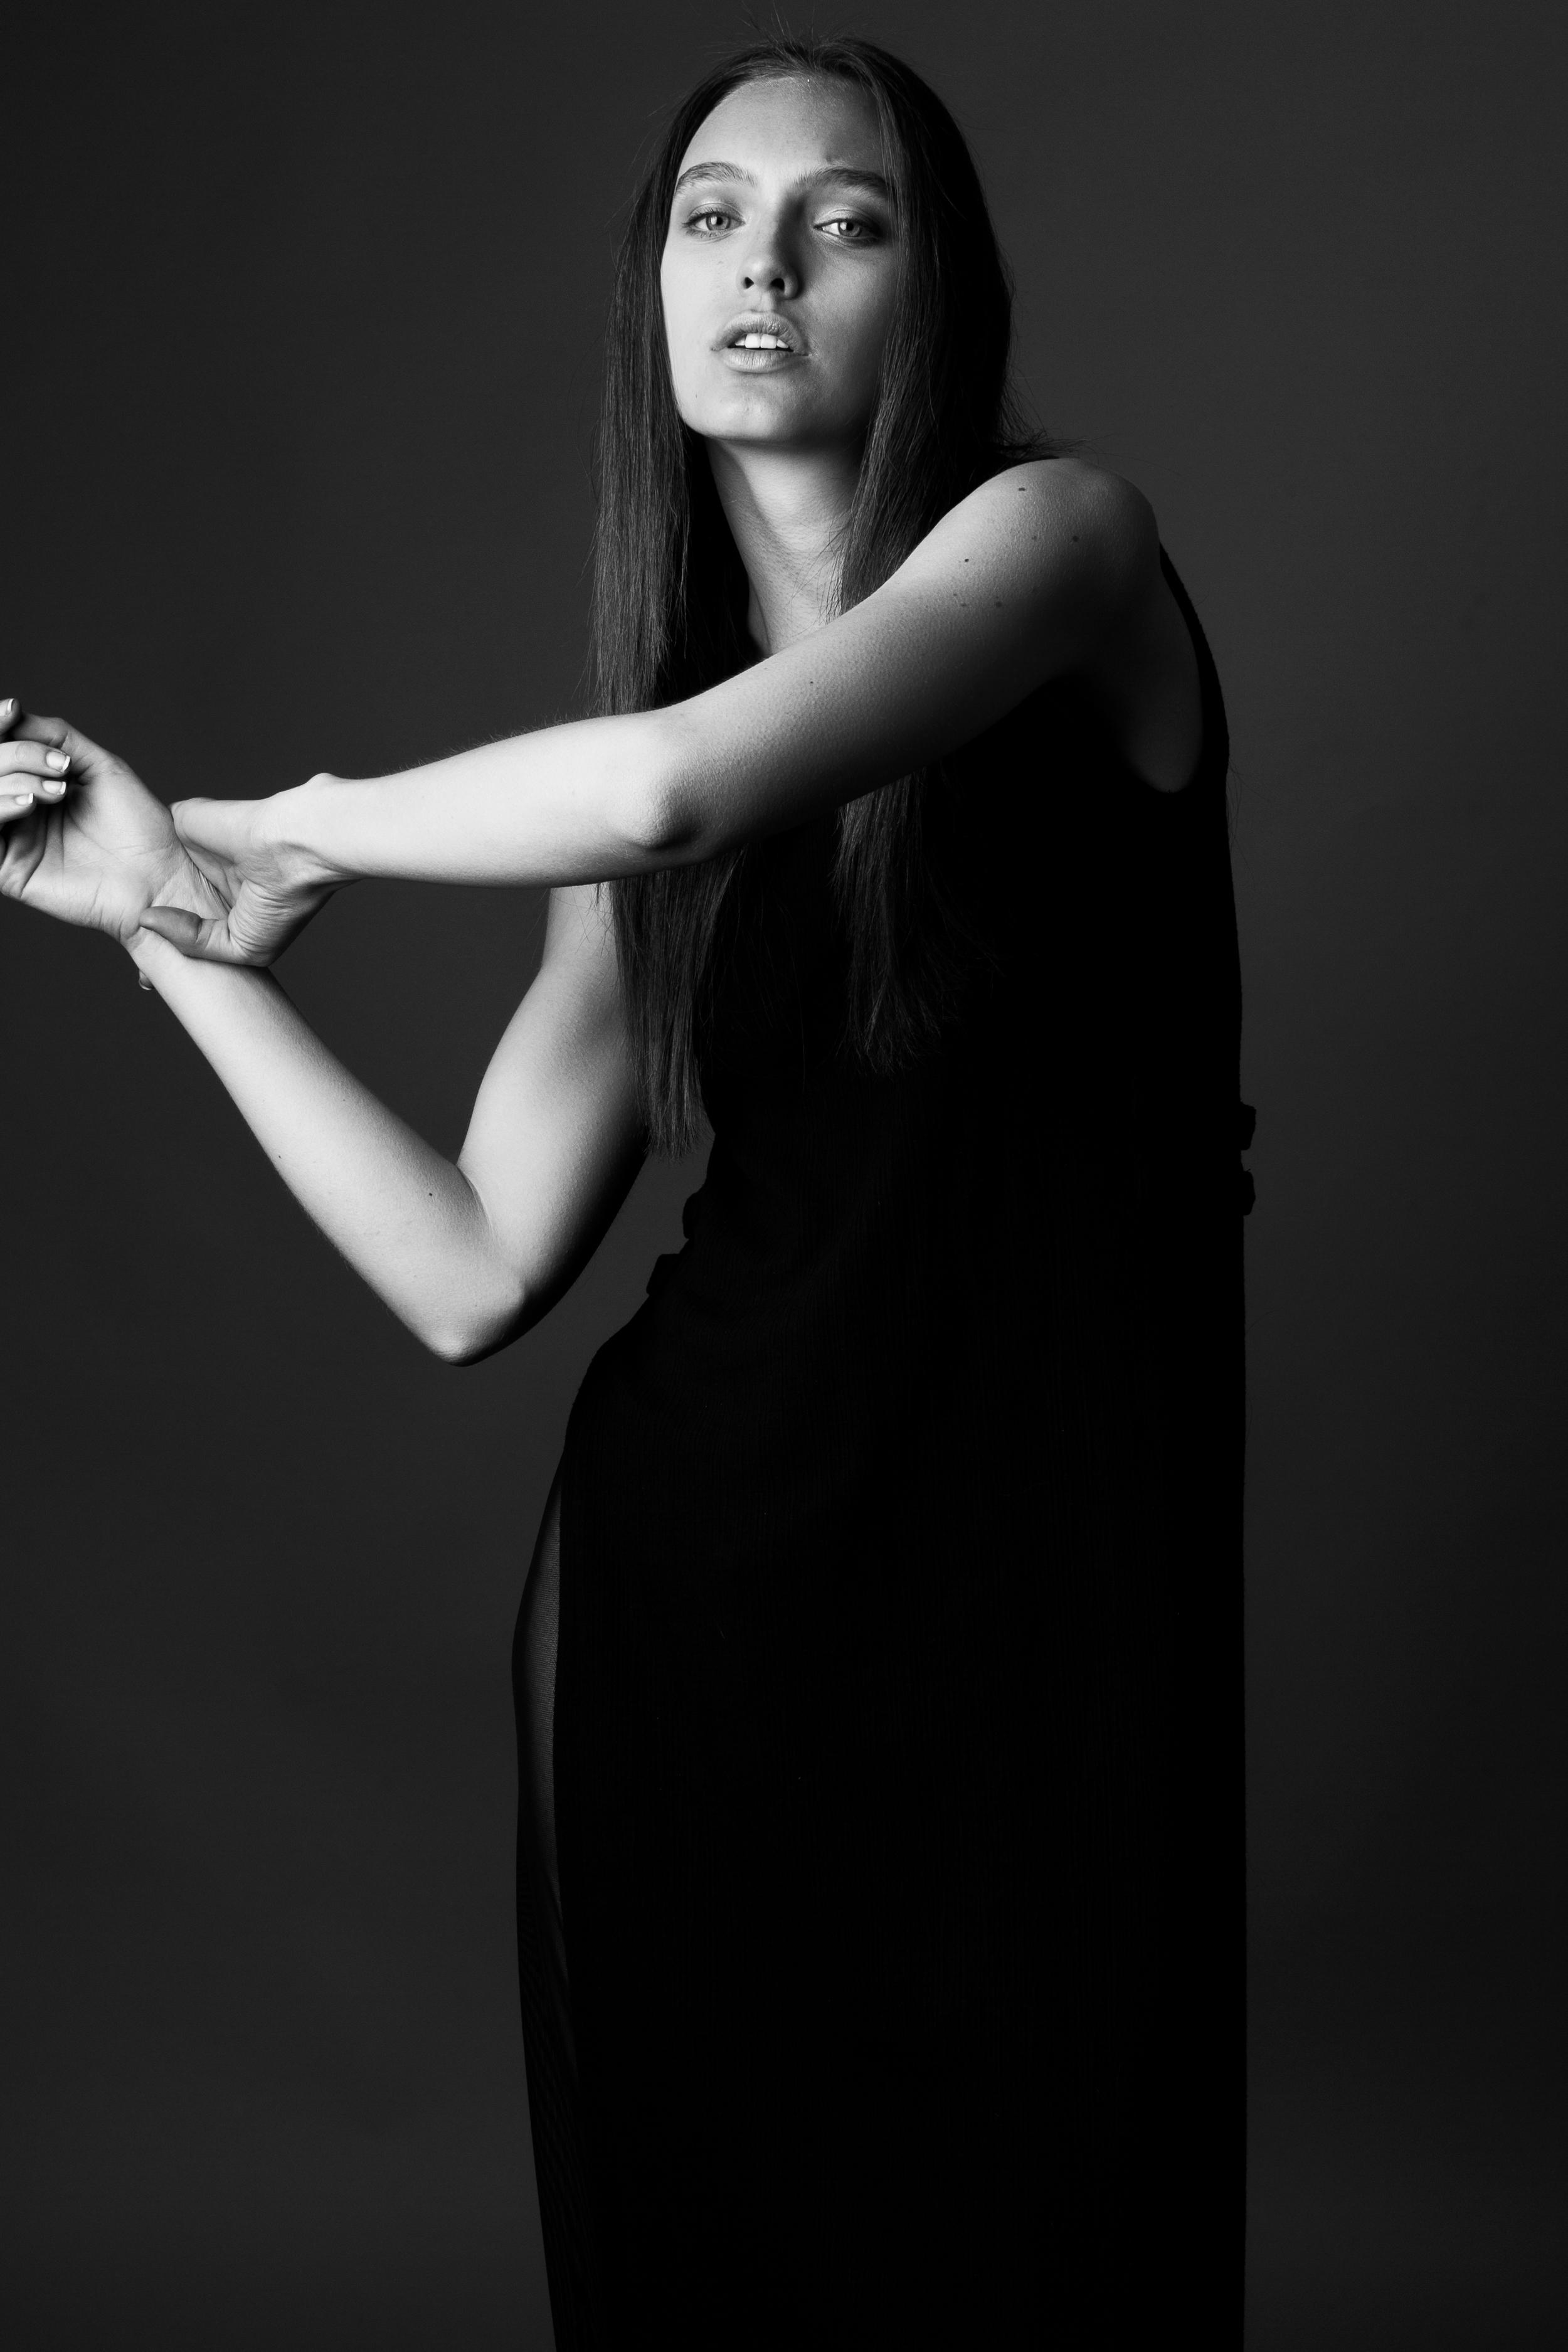 model CRYSTAL   photographer BONNIE NICHOALDS   featured designer  XJAFINE   styled by NIK